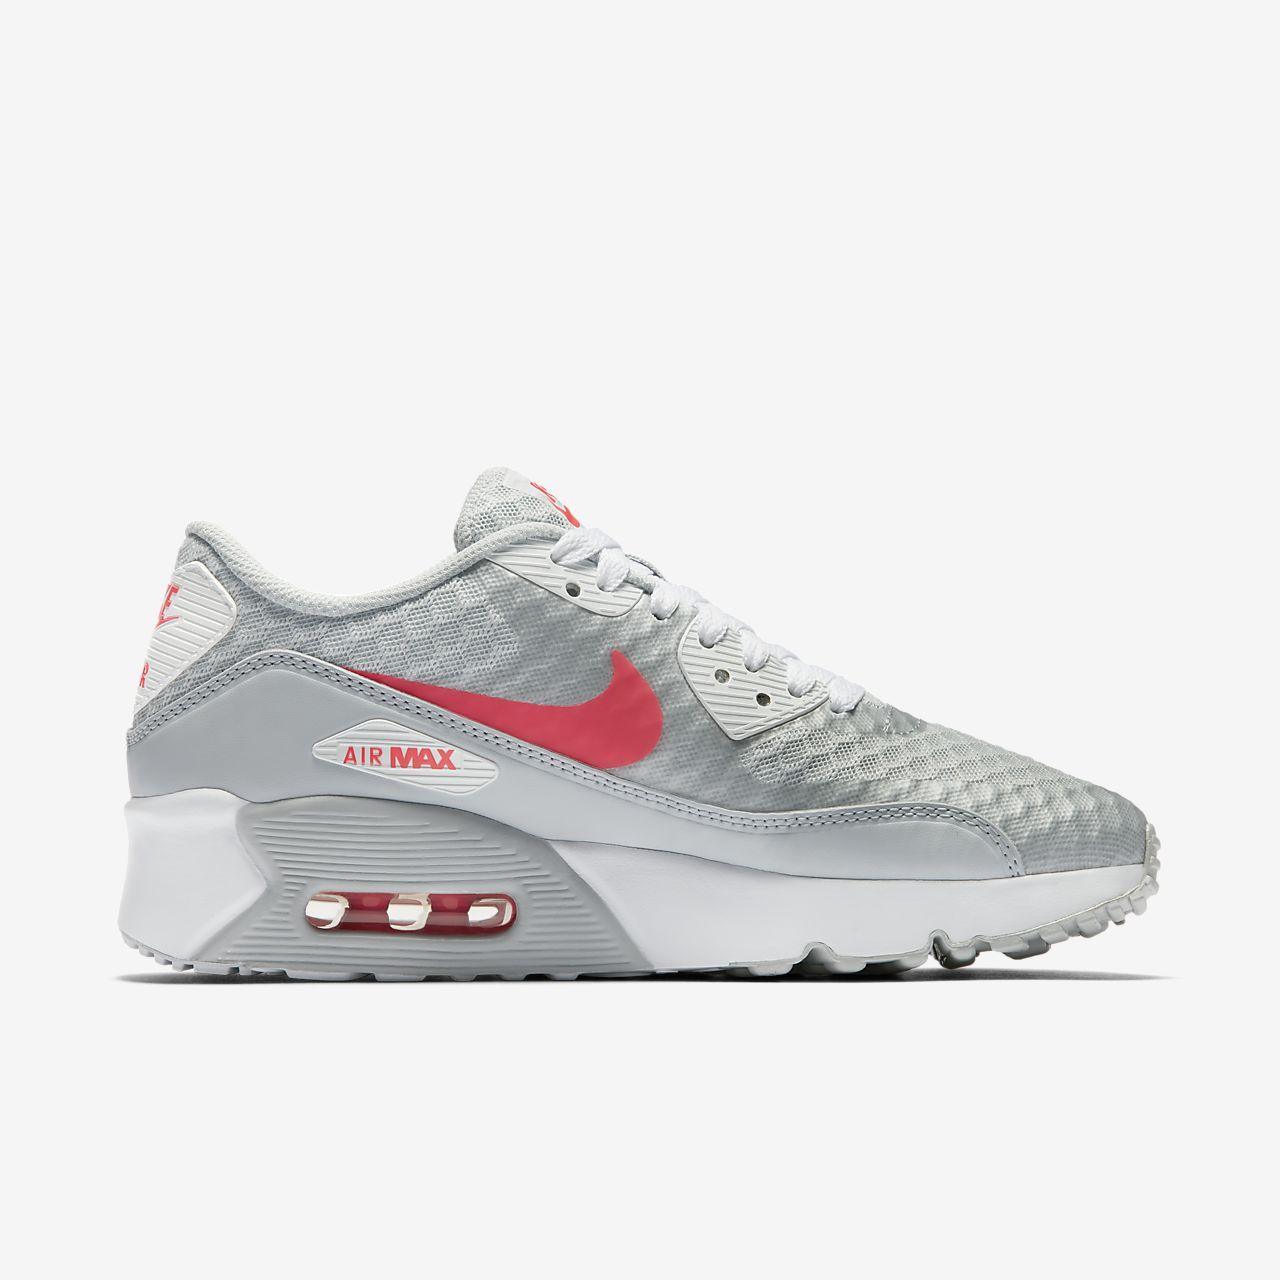 ... Nike Air Max 90 Ultra 2.0 BR Schuh für ältere Kinder